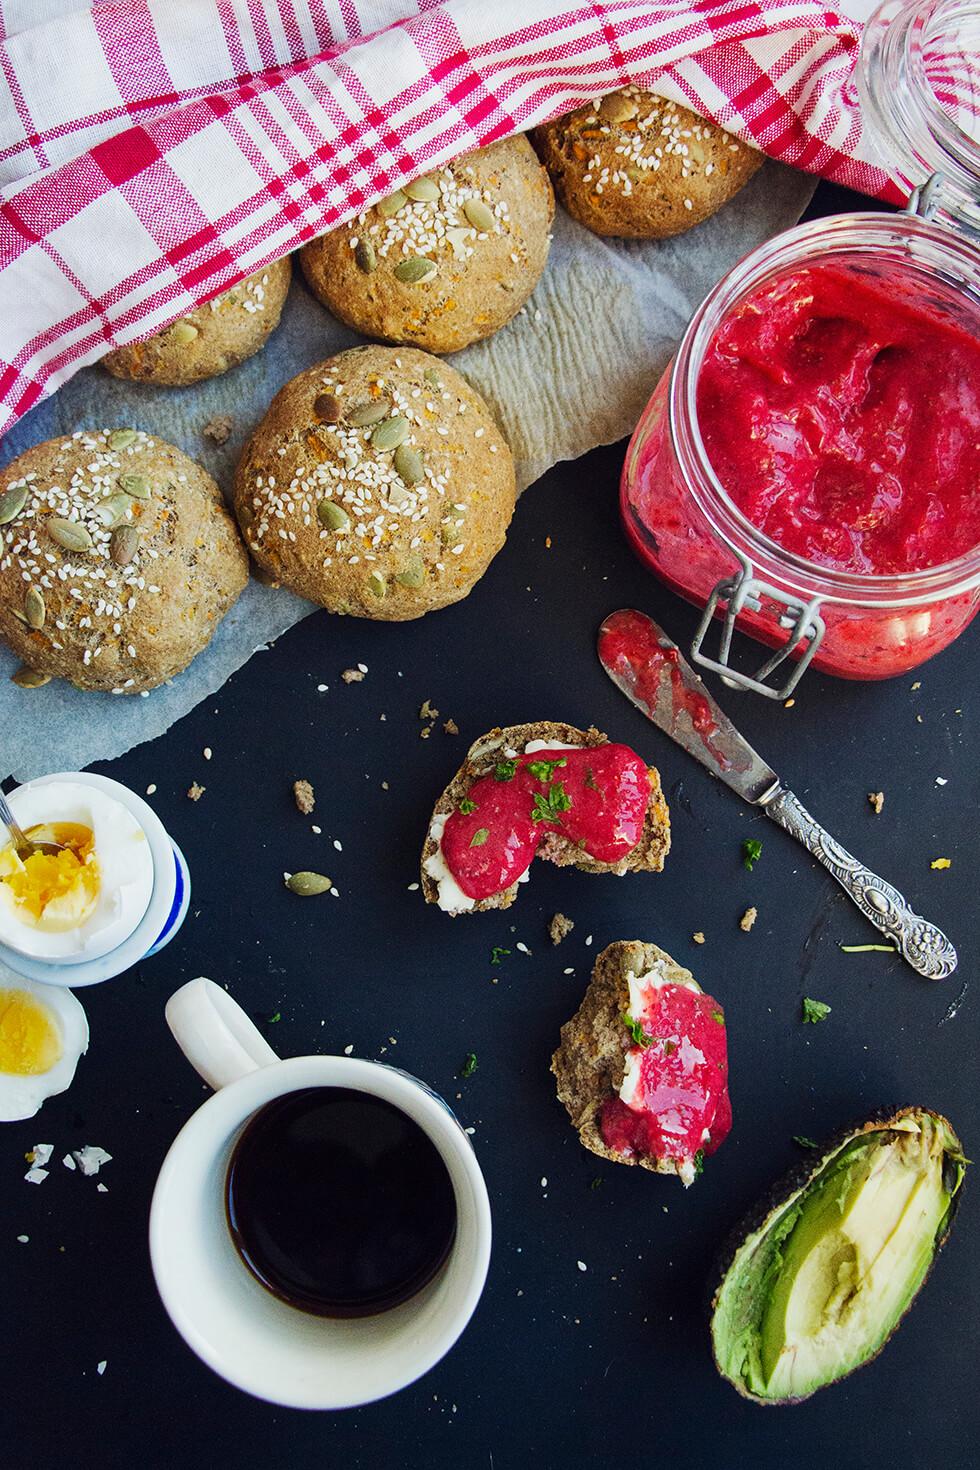 saftiga_enkla_glutenfria_frukostbrod_halsosam_jordgubbsmarmelad_2